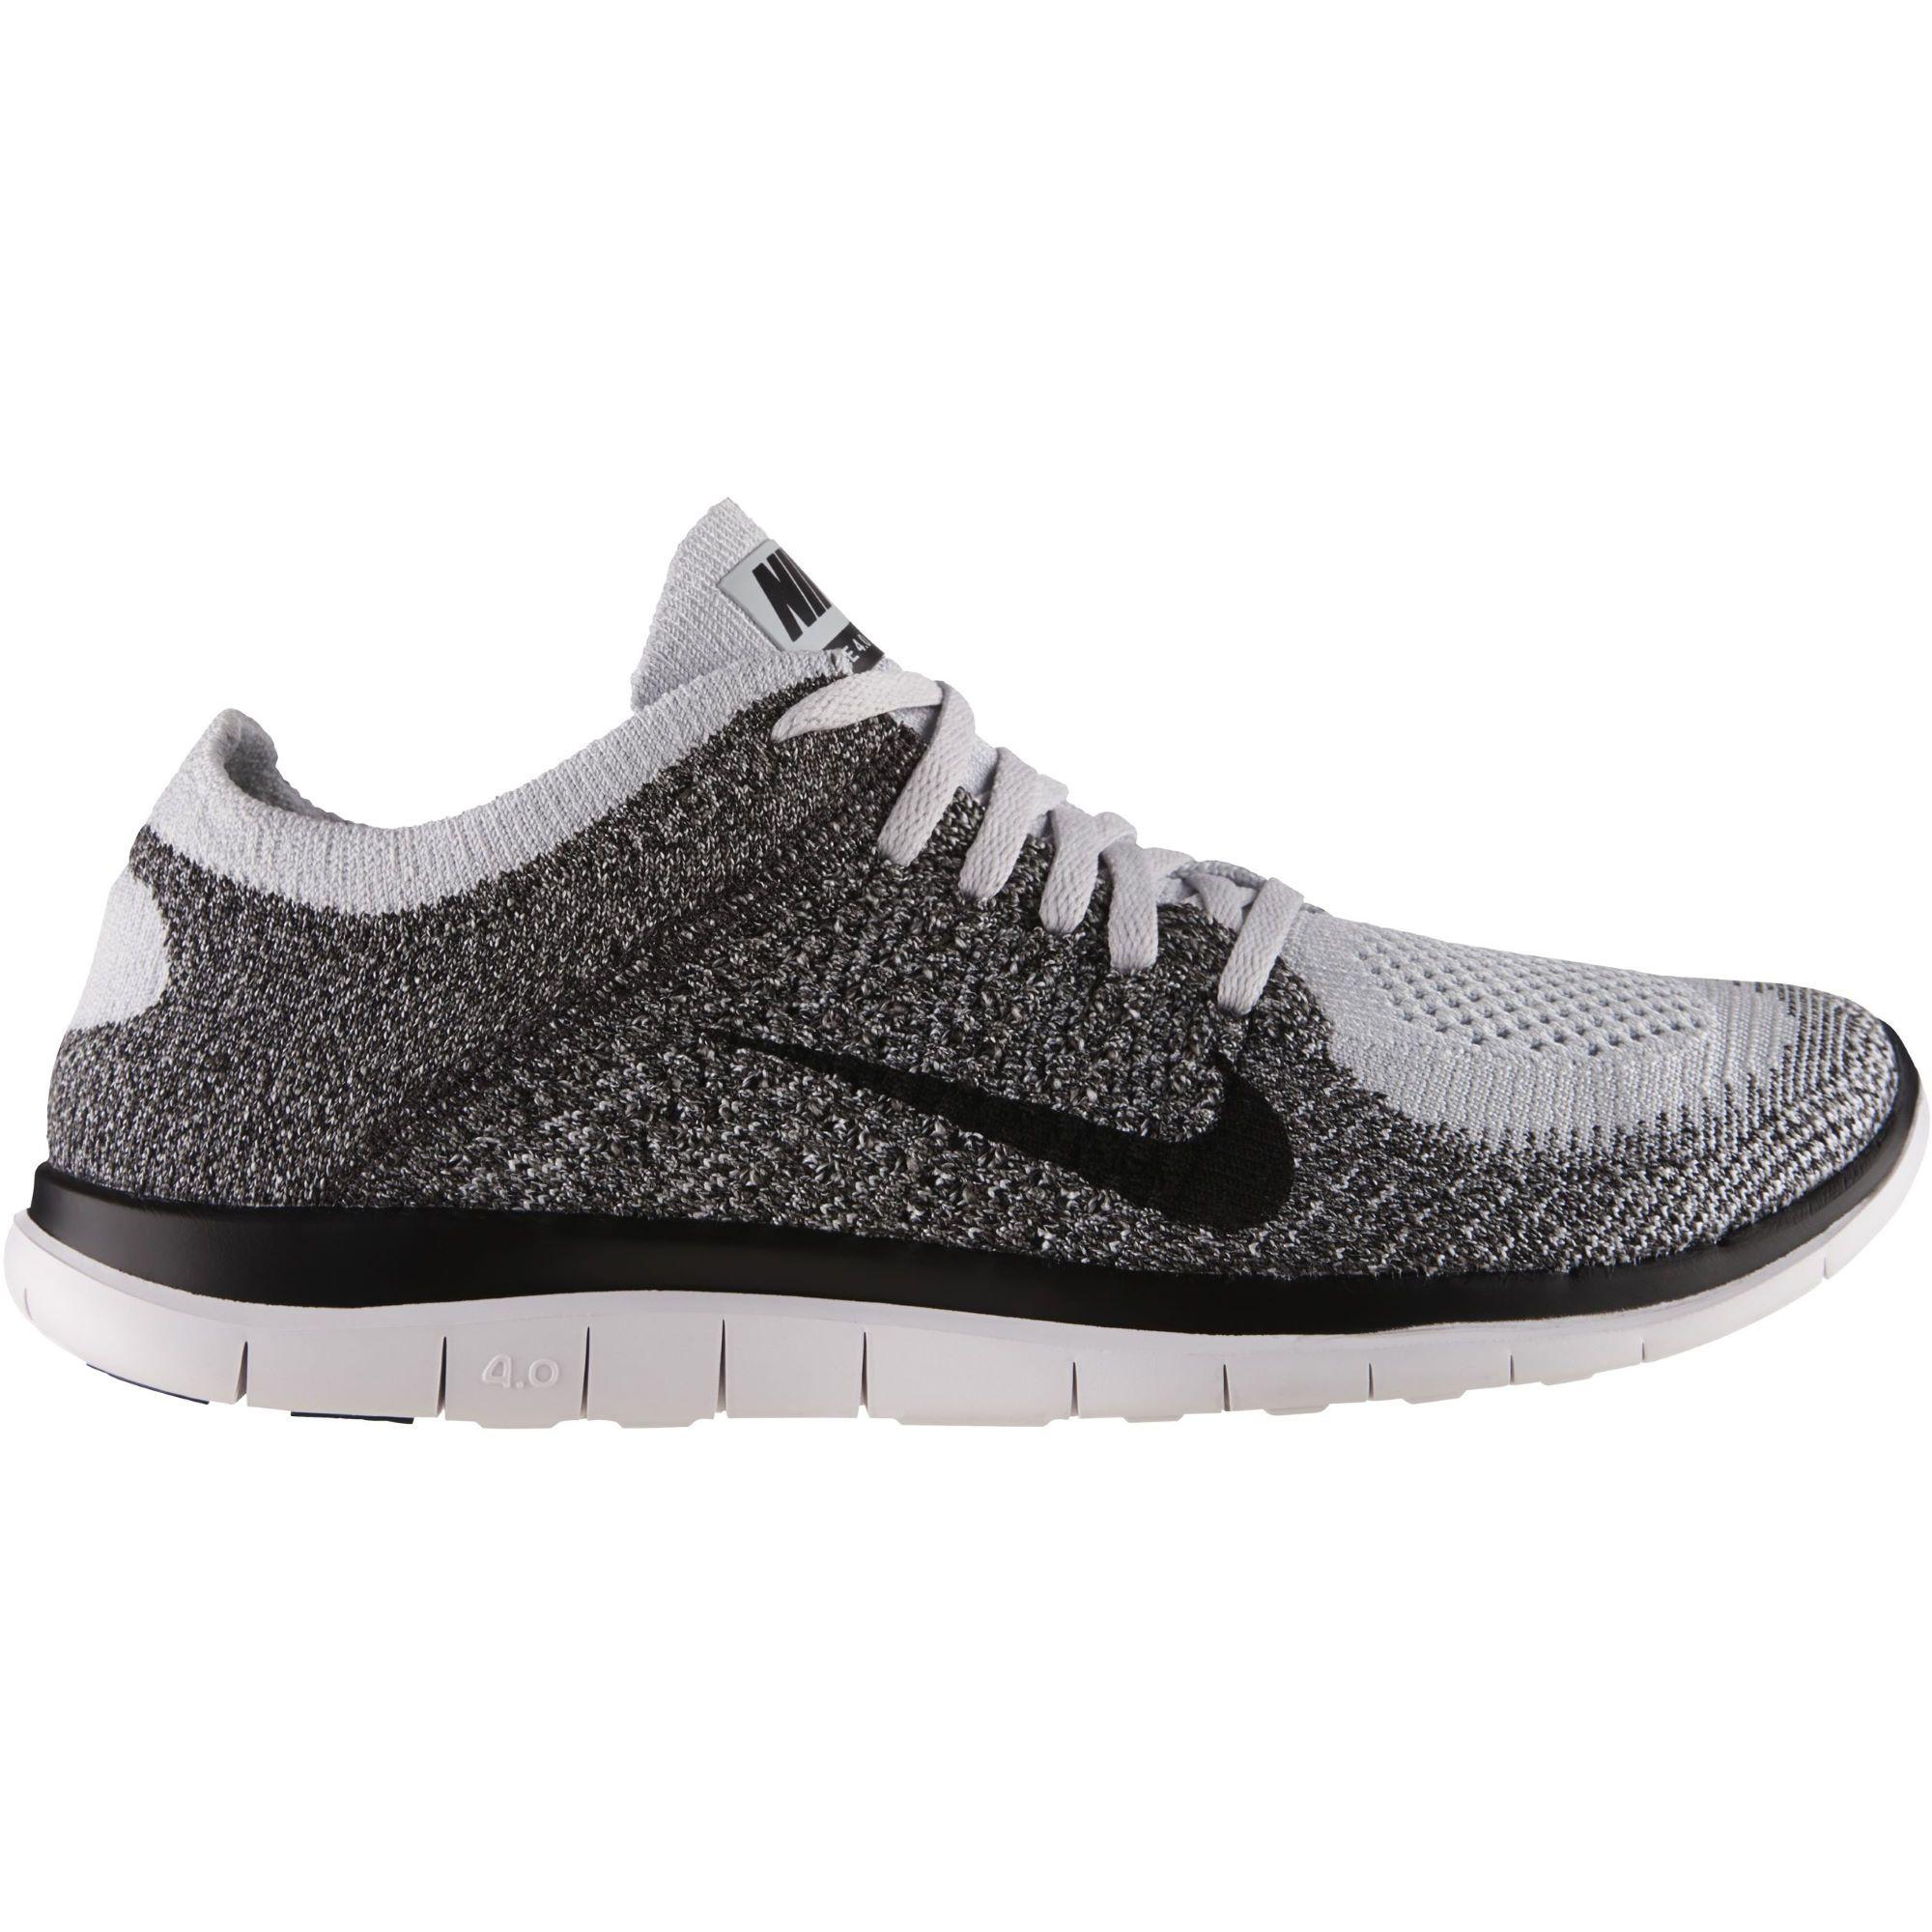 san francisco bc1ab 0d3c3 49.99 Mens Nike Free 3.0 V6 Flyknit Black Wolf White Black Pinterest Roshe,  Nike roshe Nike Free Flyknit 3.0 Running Shoes Womens ...